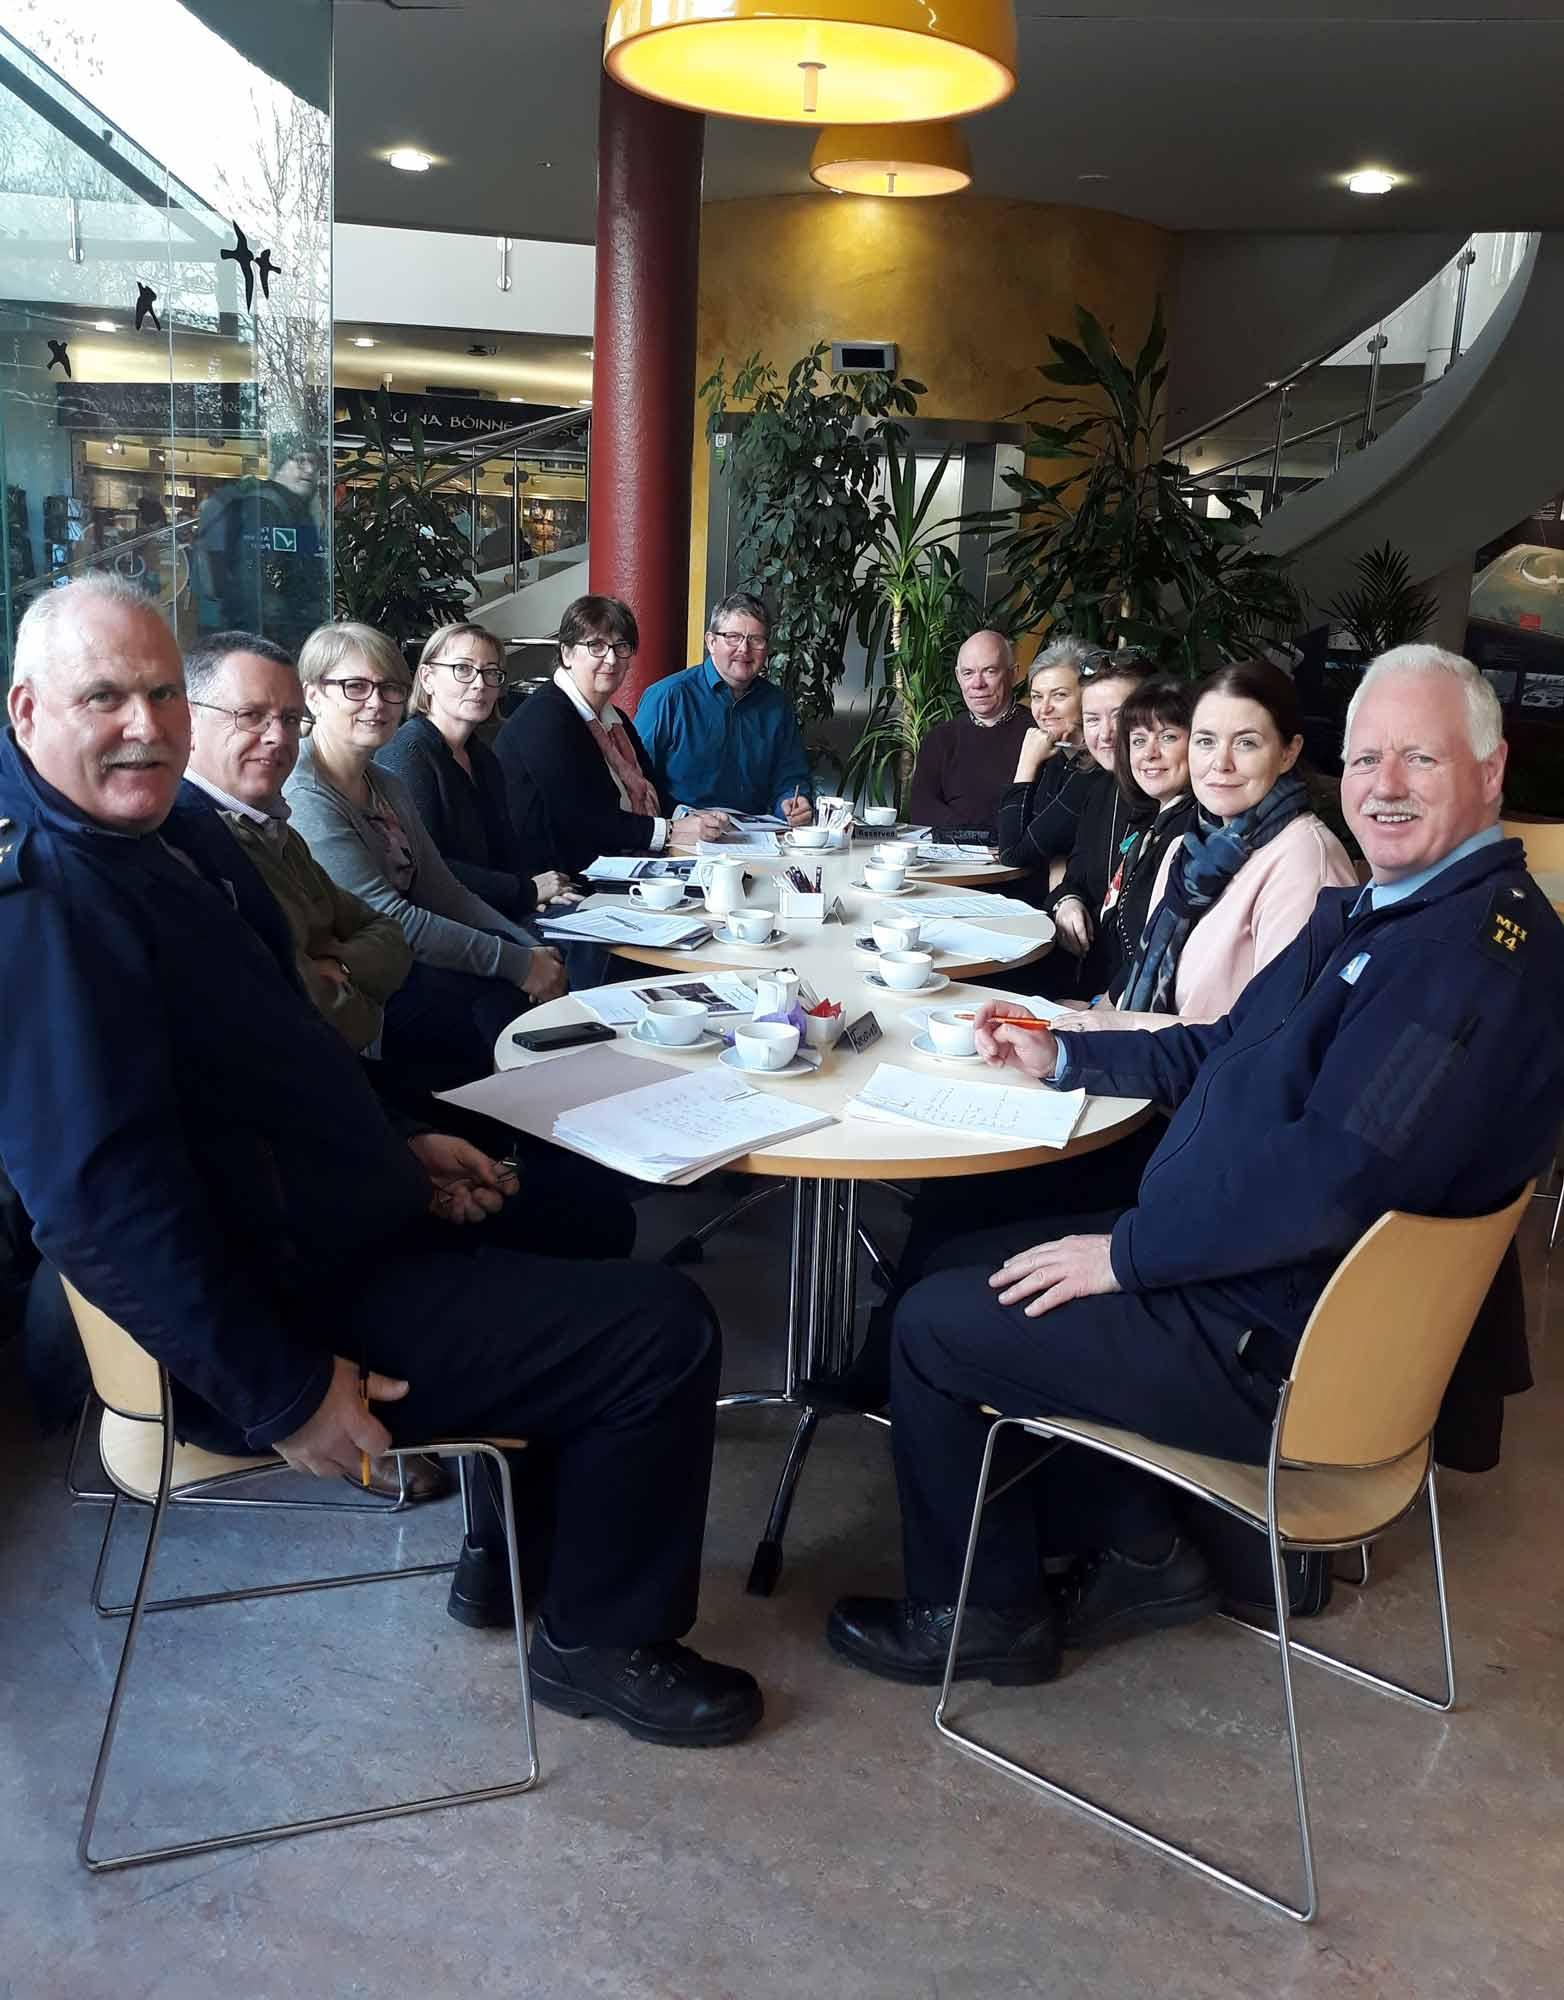 Solstice planning meeting November 2018